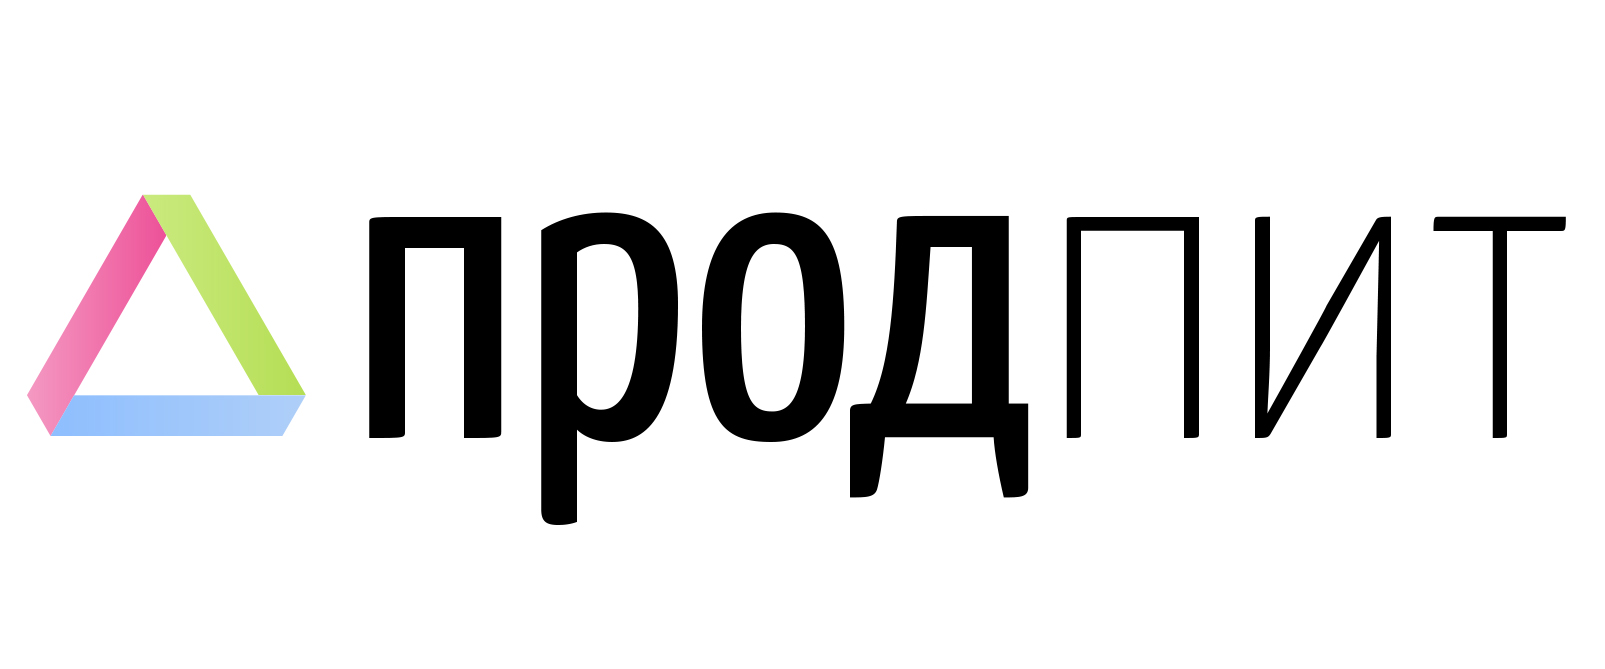 prodpit ooo-omega-